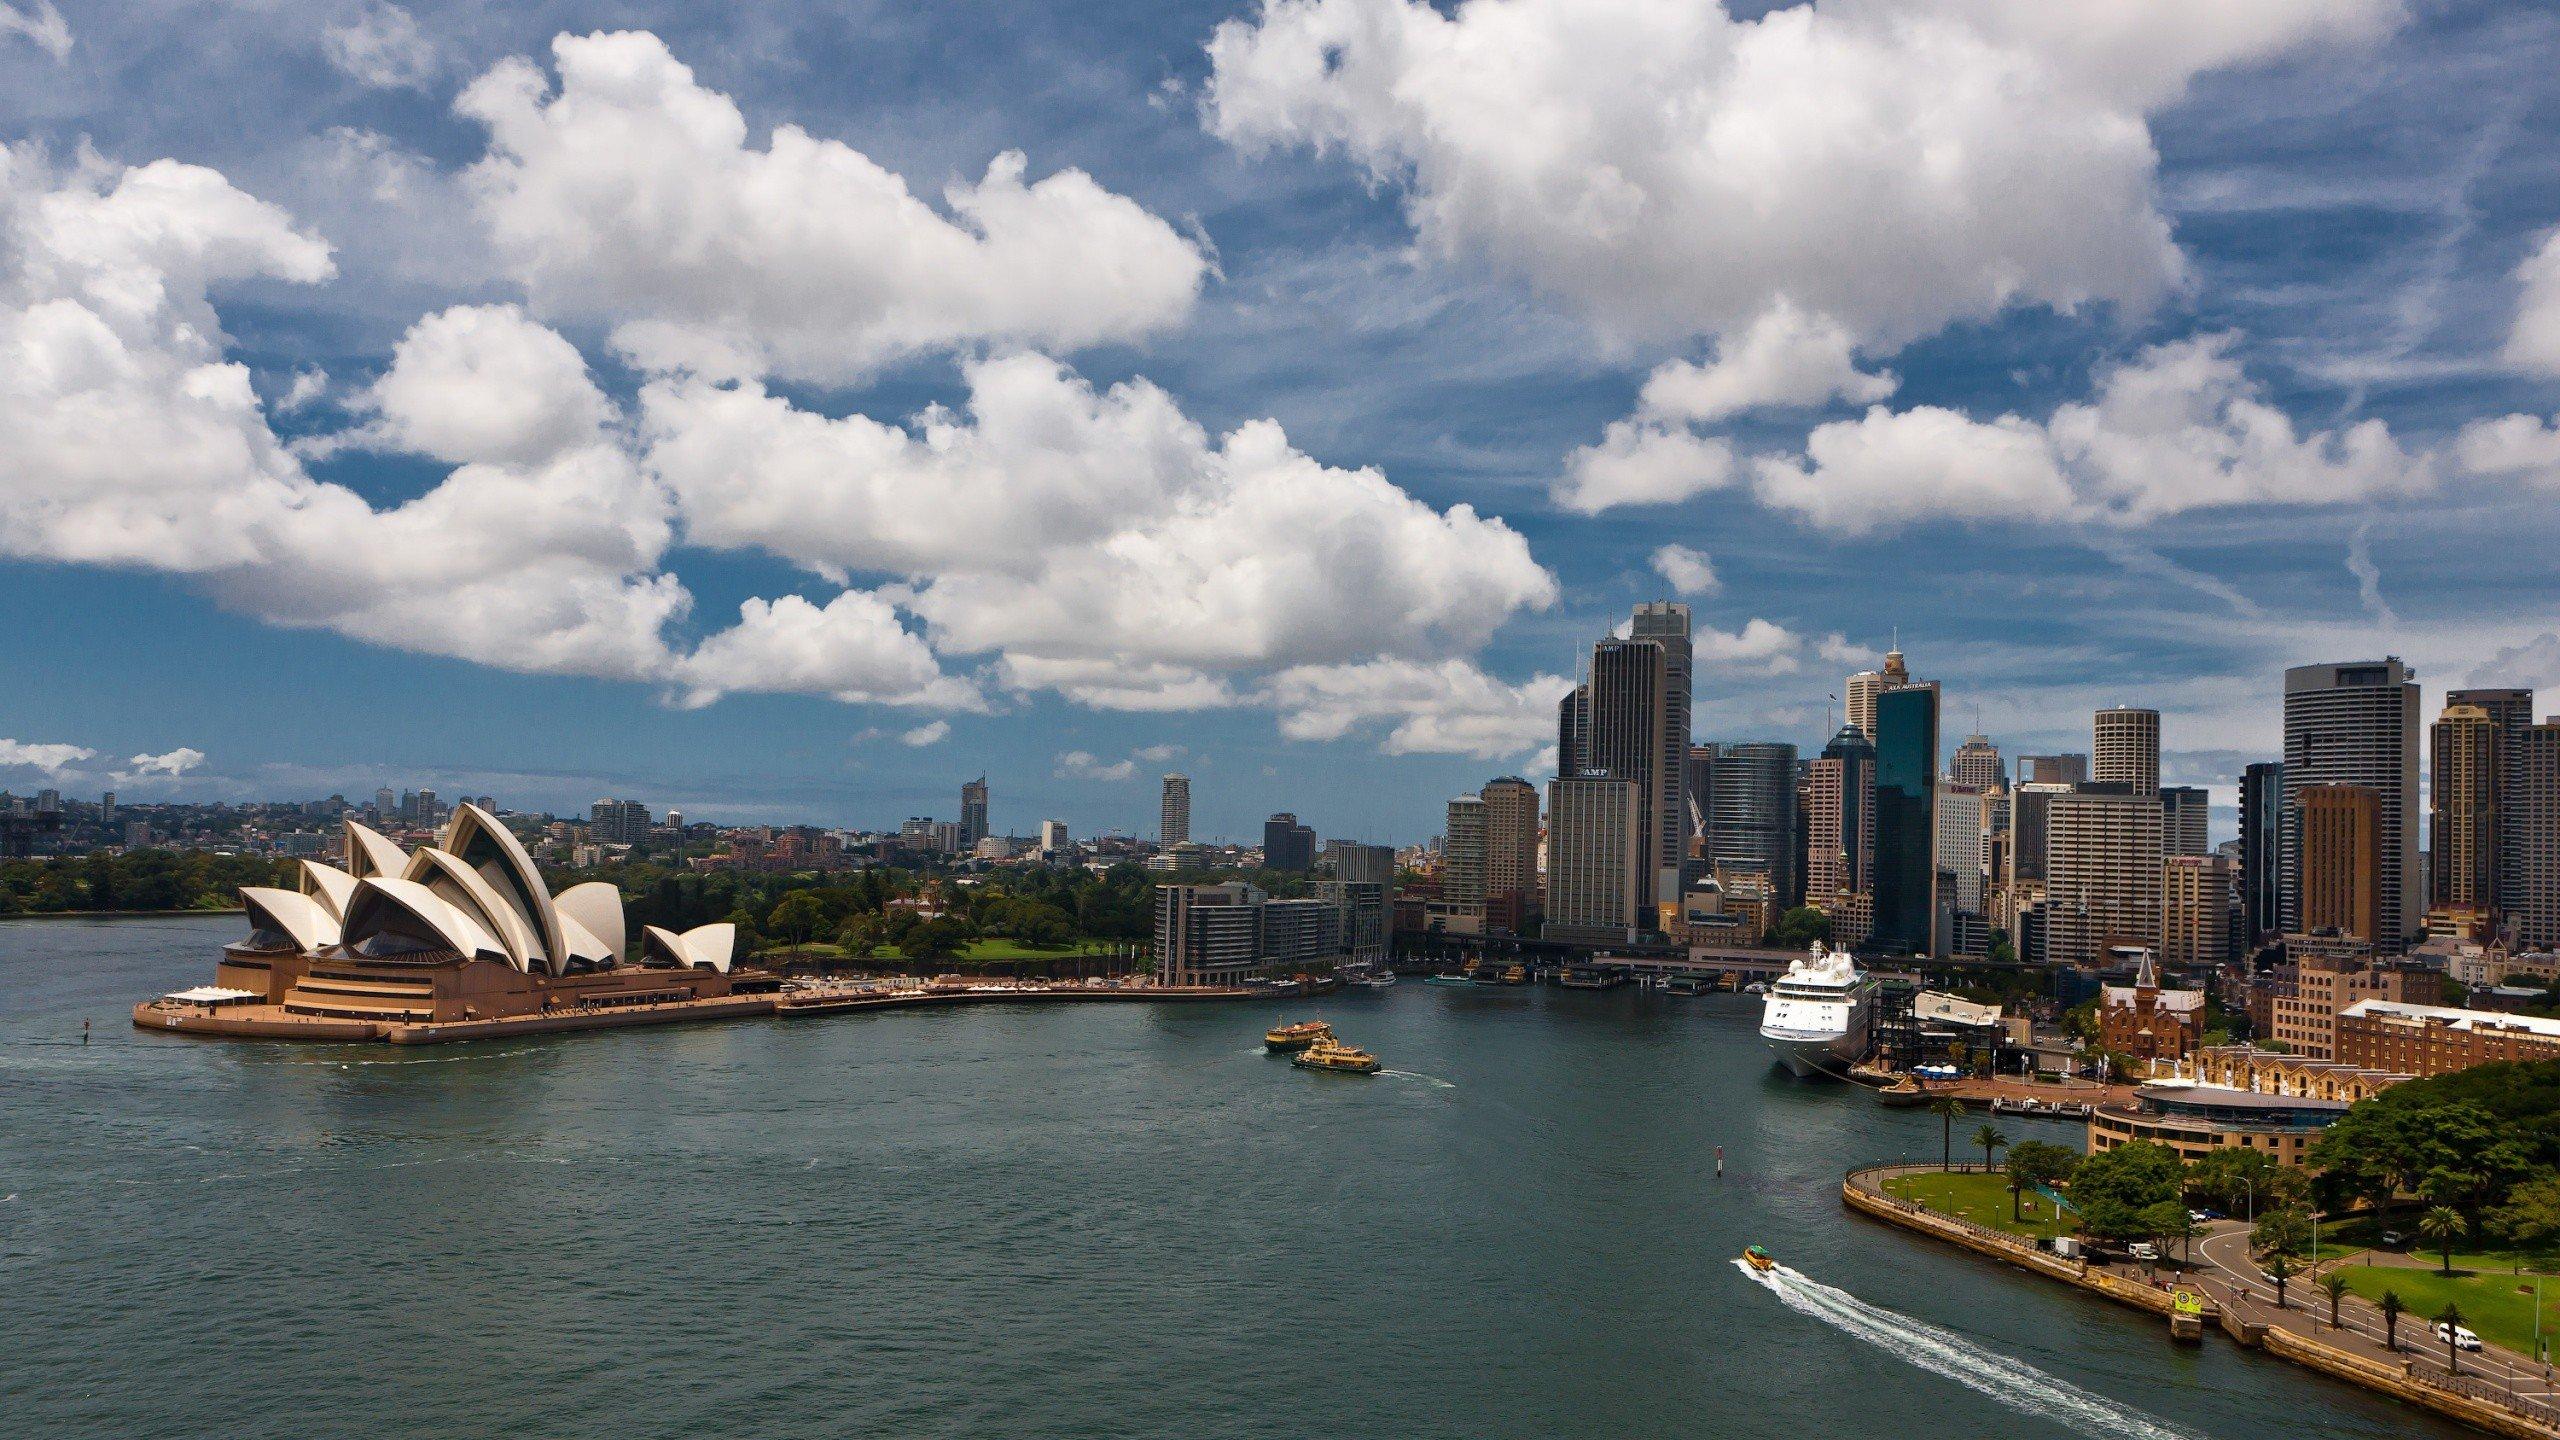 2560x1440 px Sydney Sydney Harbour Sydney Opera House